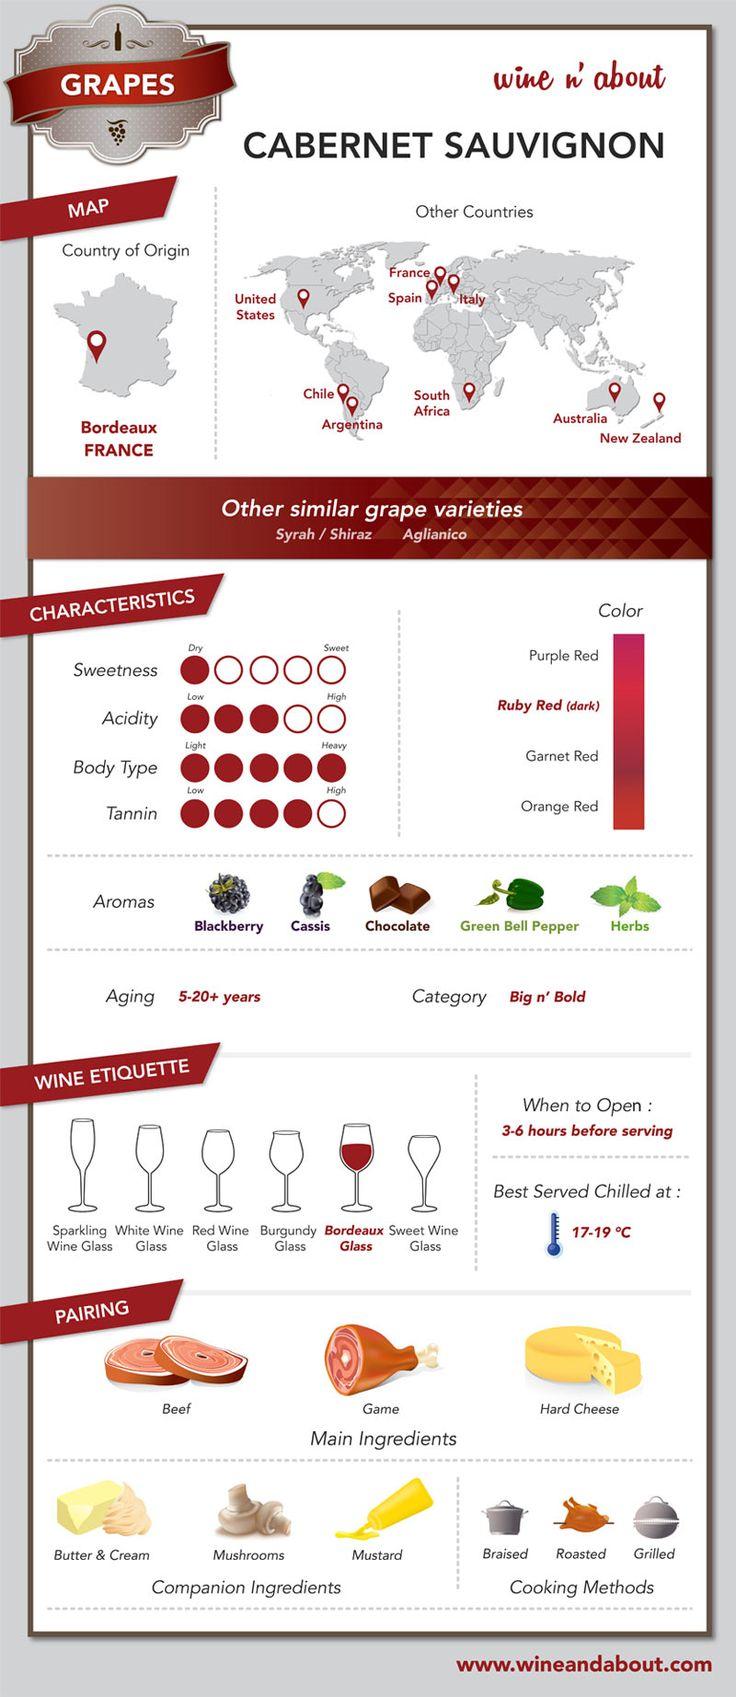 Všetko čo by ste mali vedieť o odrode Cabernet Sauvignon ............... Learn everything you ever wanted to know about Cabernet Sauvignon. #Wine